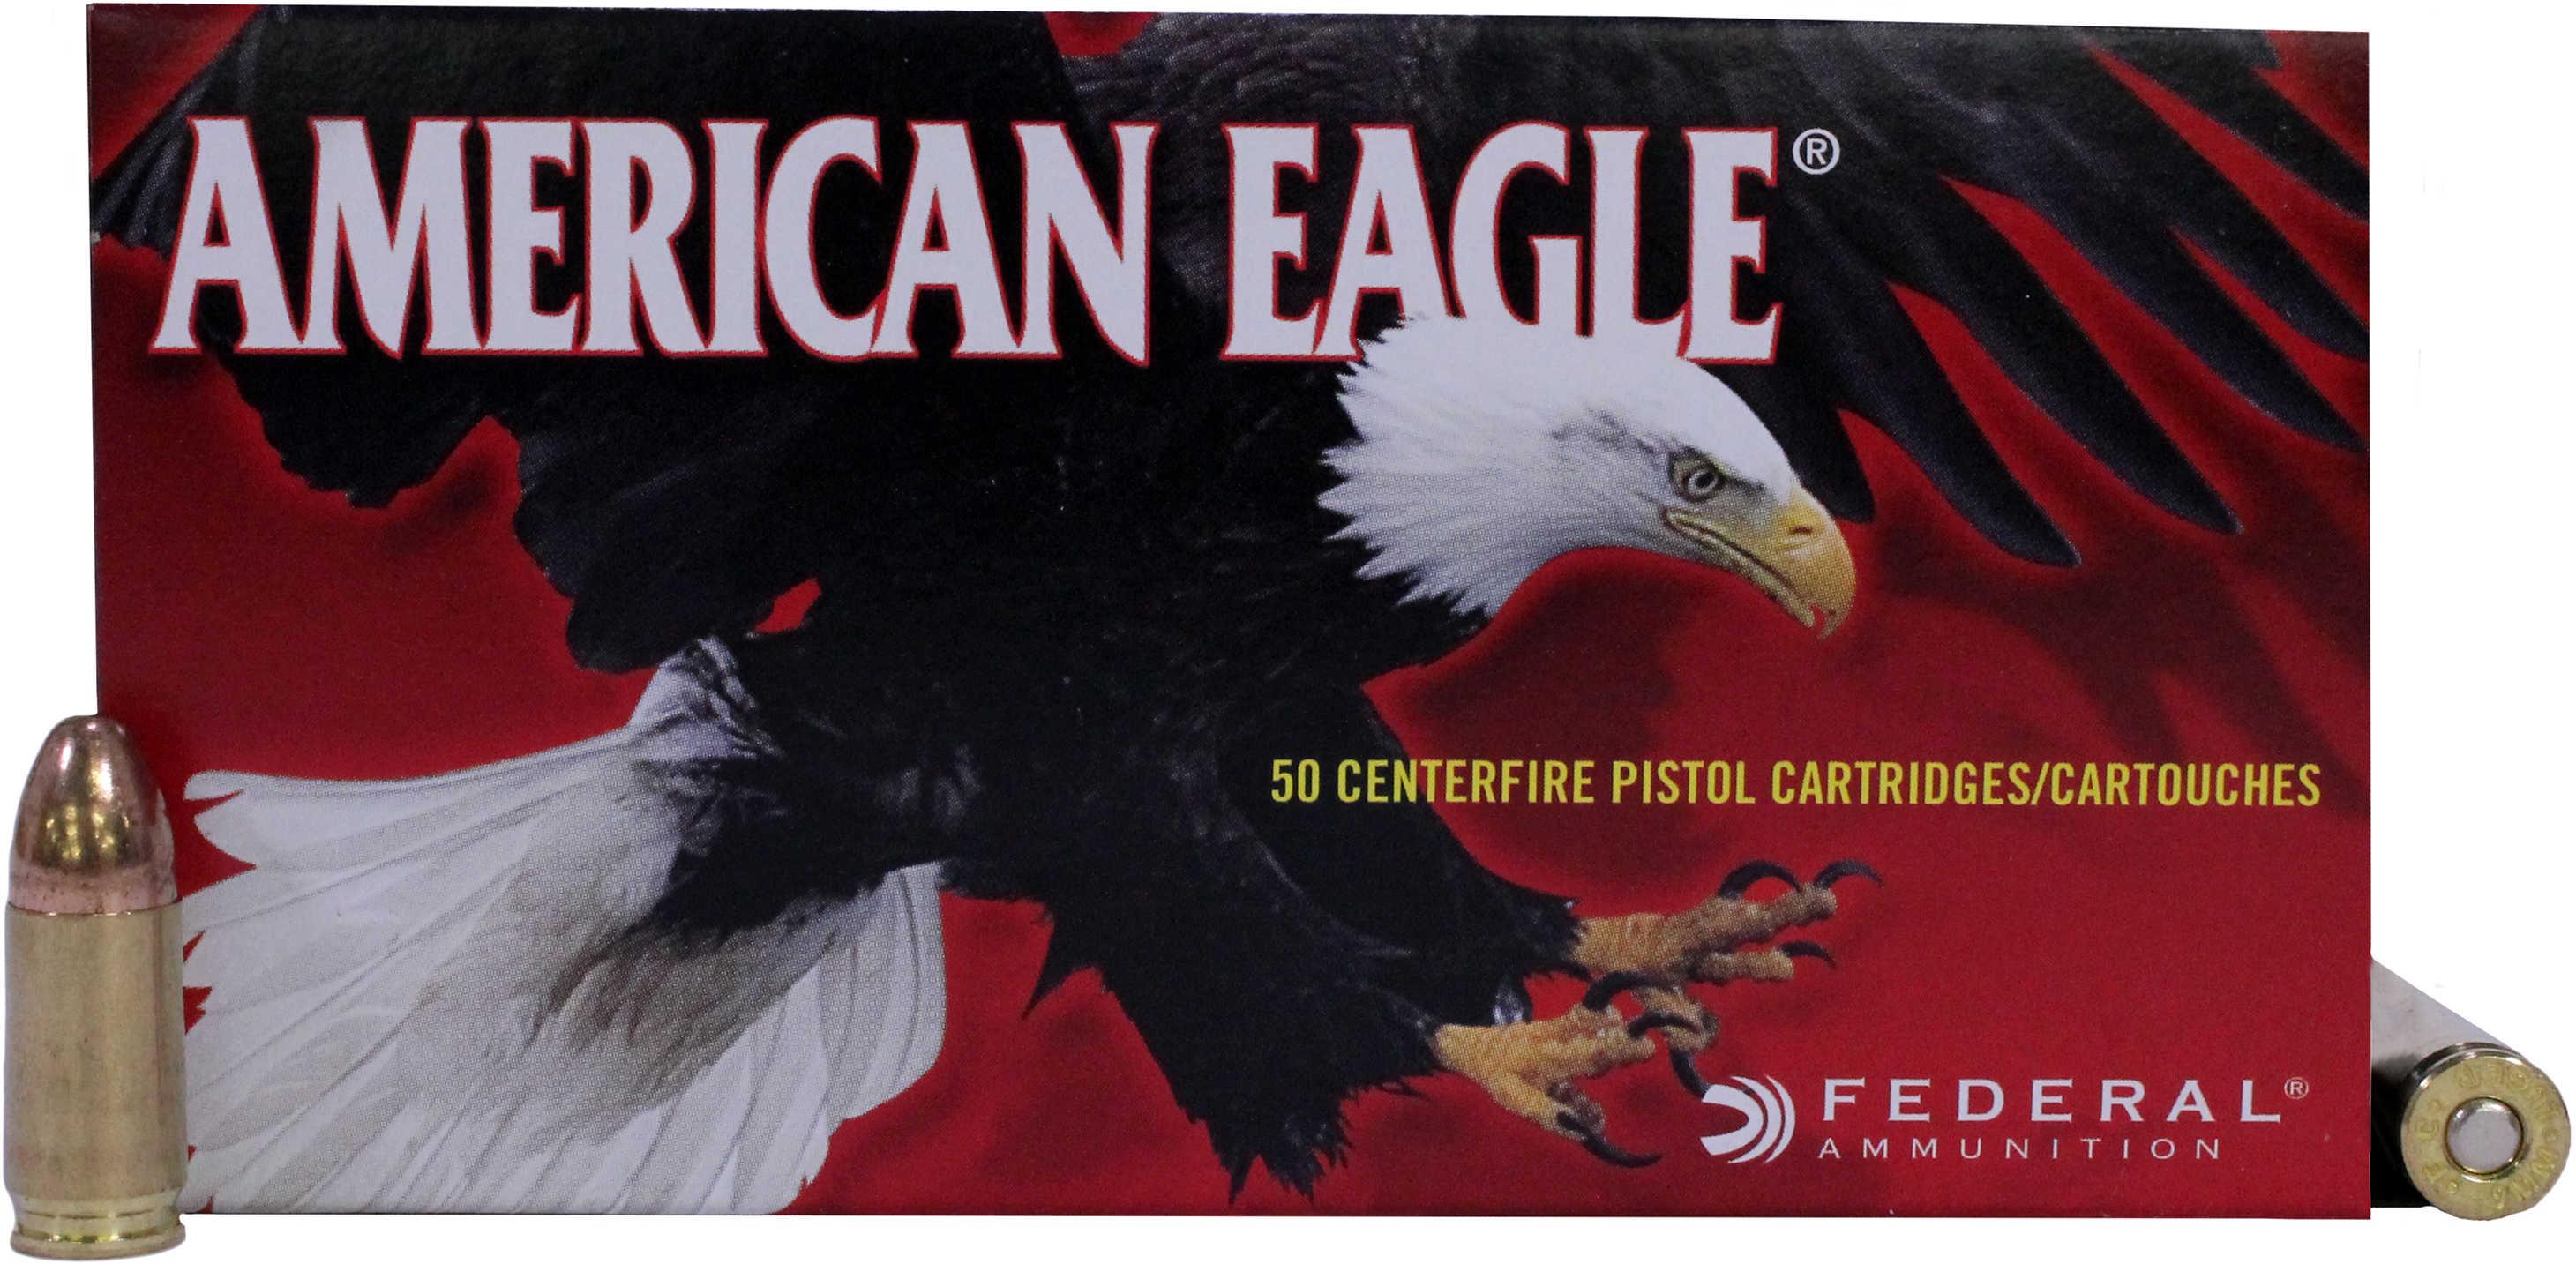 Federal Cartridge 9mm Luger 9mm Luger, 124gr, Full Metal Jacket, (Per 50) AE9AP